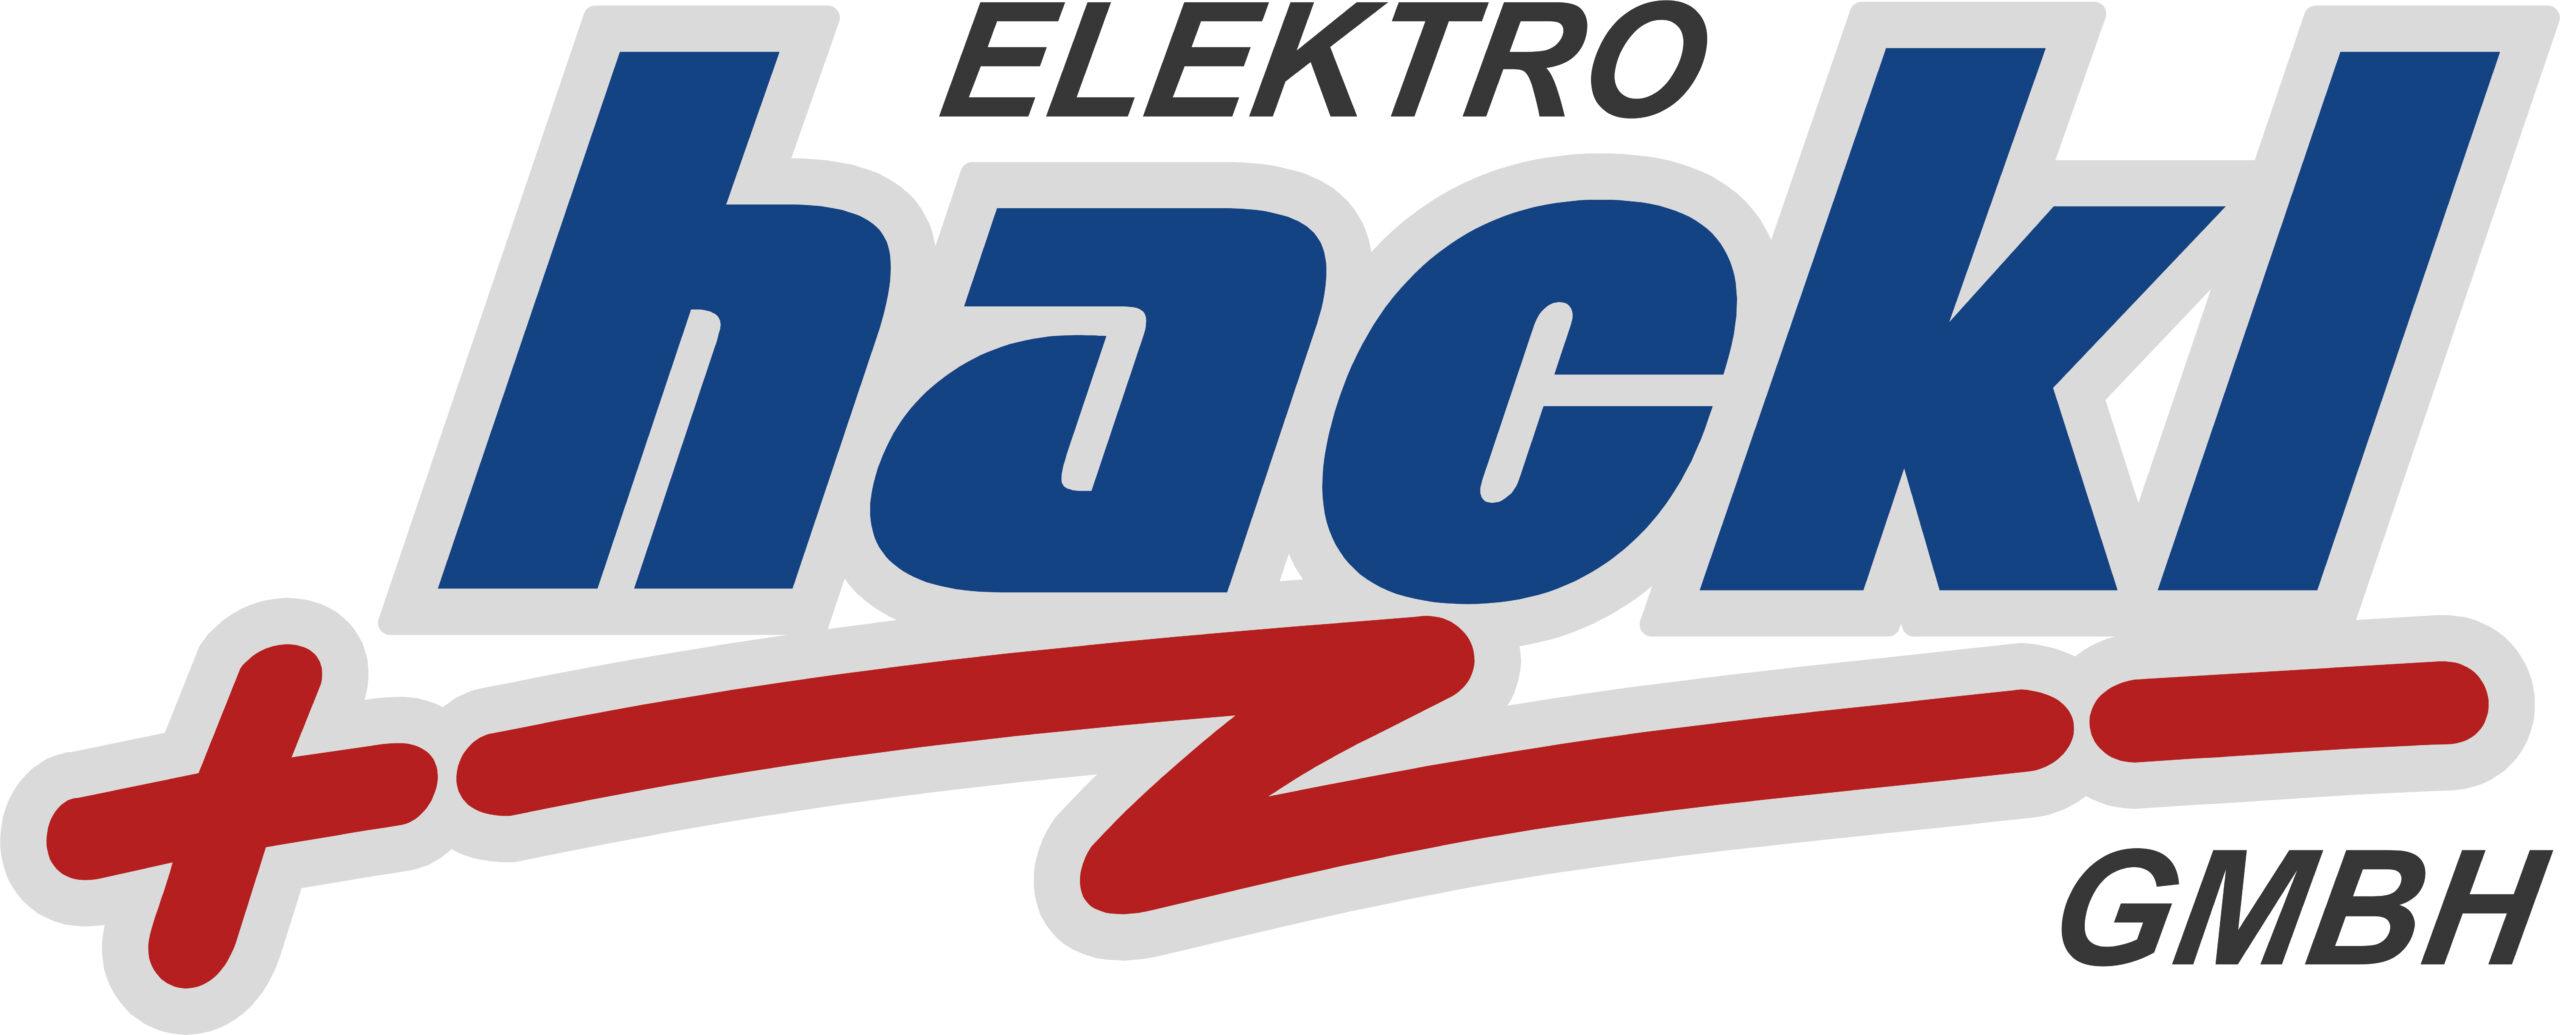 hackl_logo